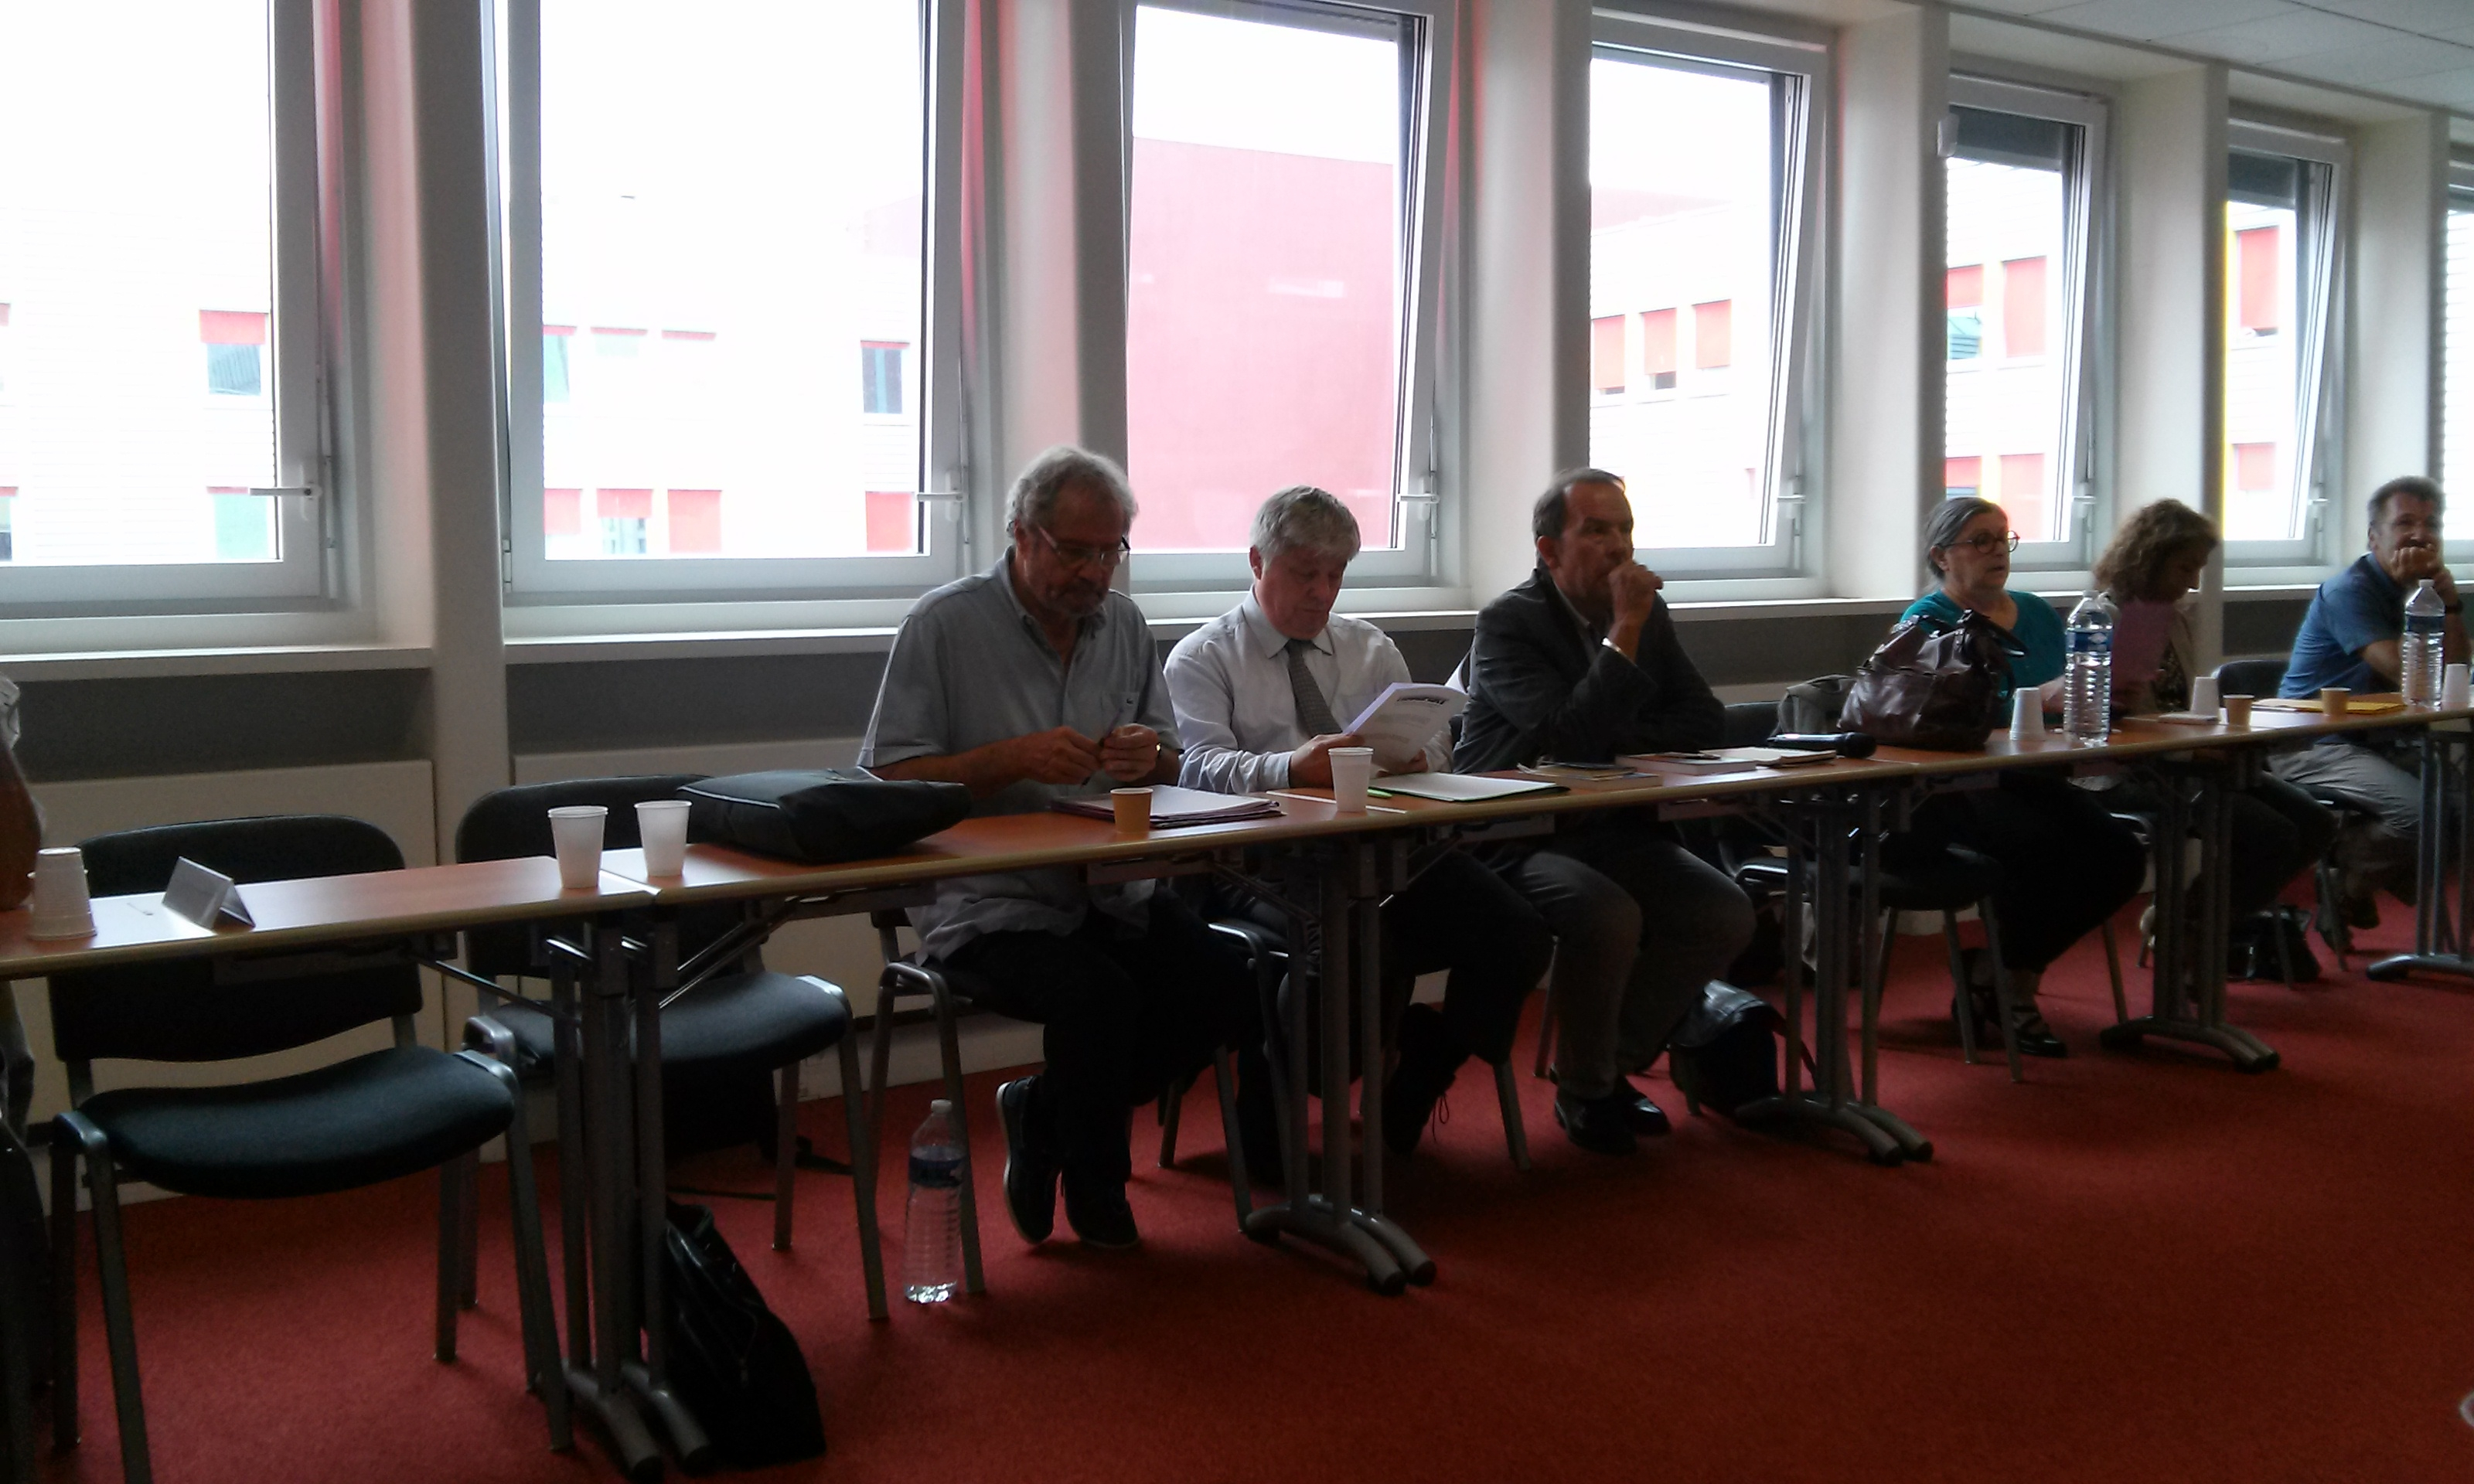 Alain BOLLON, Jean-Pierre VILLAIN, Frédéric JESU, Claire LECONTE, Madga BENDJILALI, Jean-Charles BIECHLE